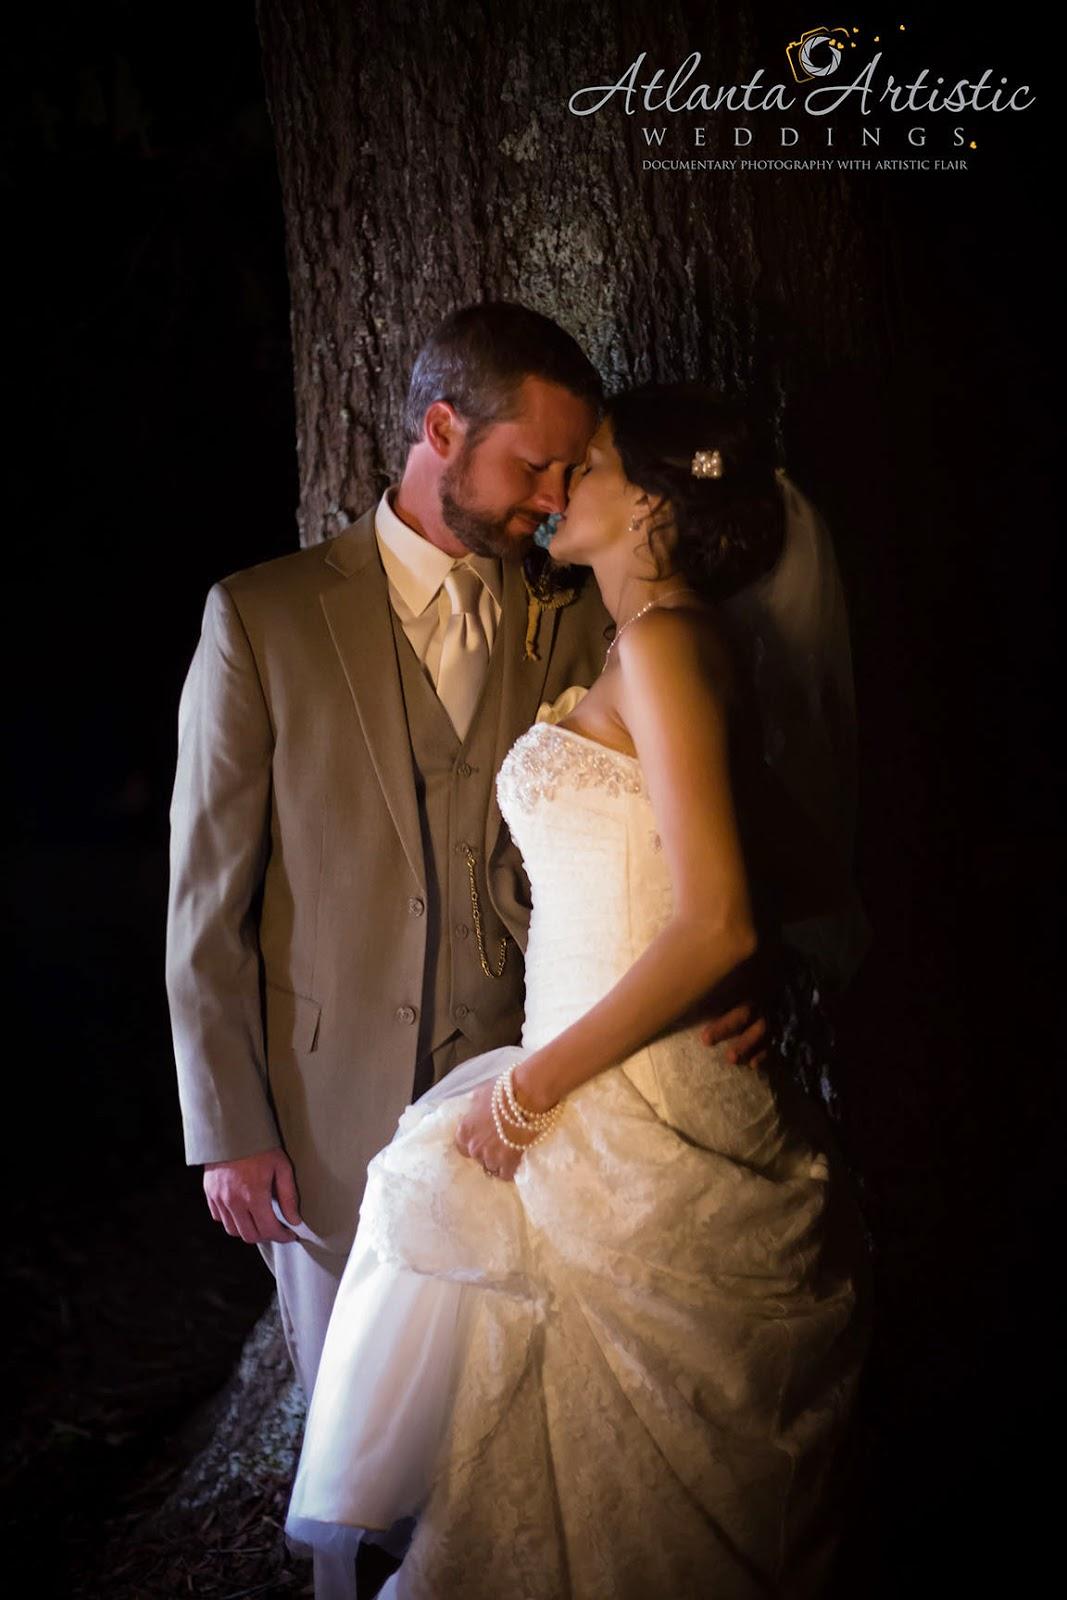 atlanta wedding photographer david diener